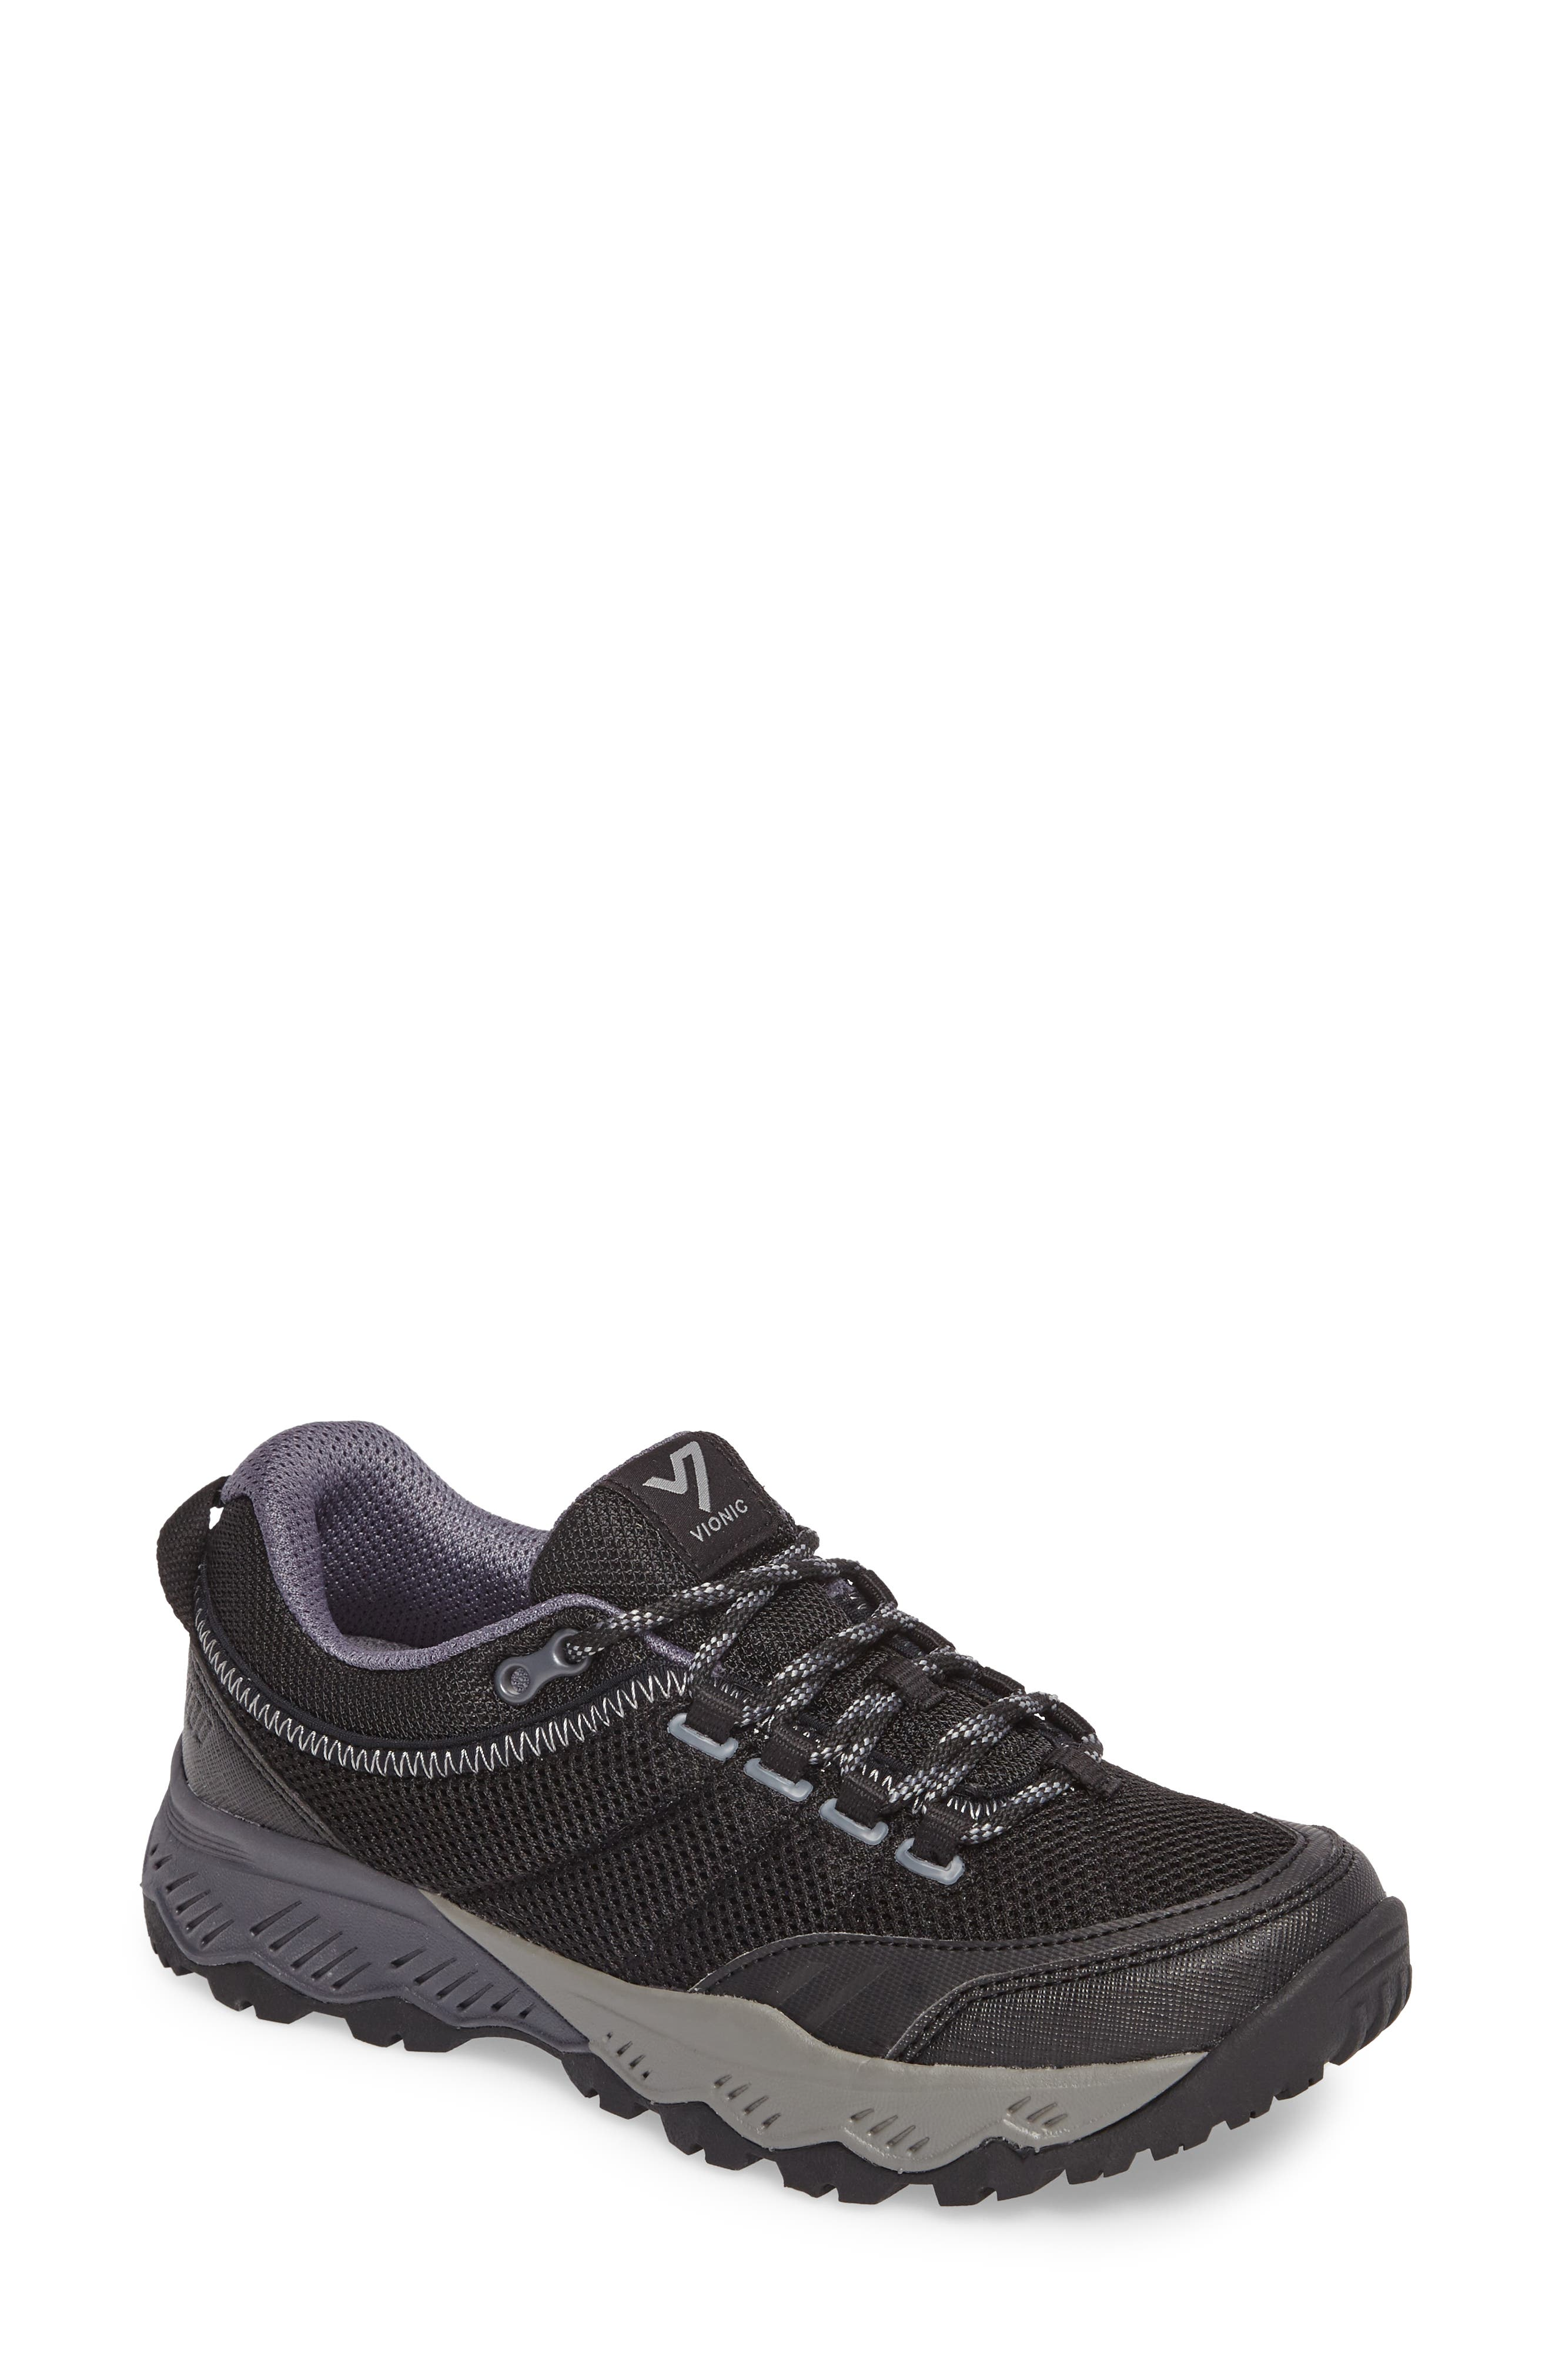 Mckinley Sneaker,                         Main,                         color, 001